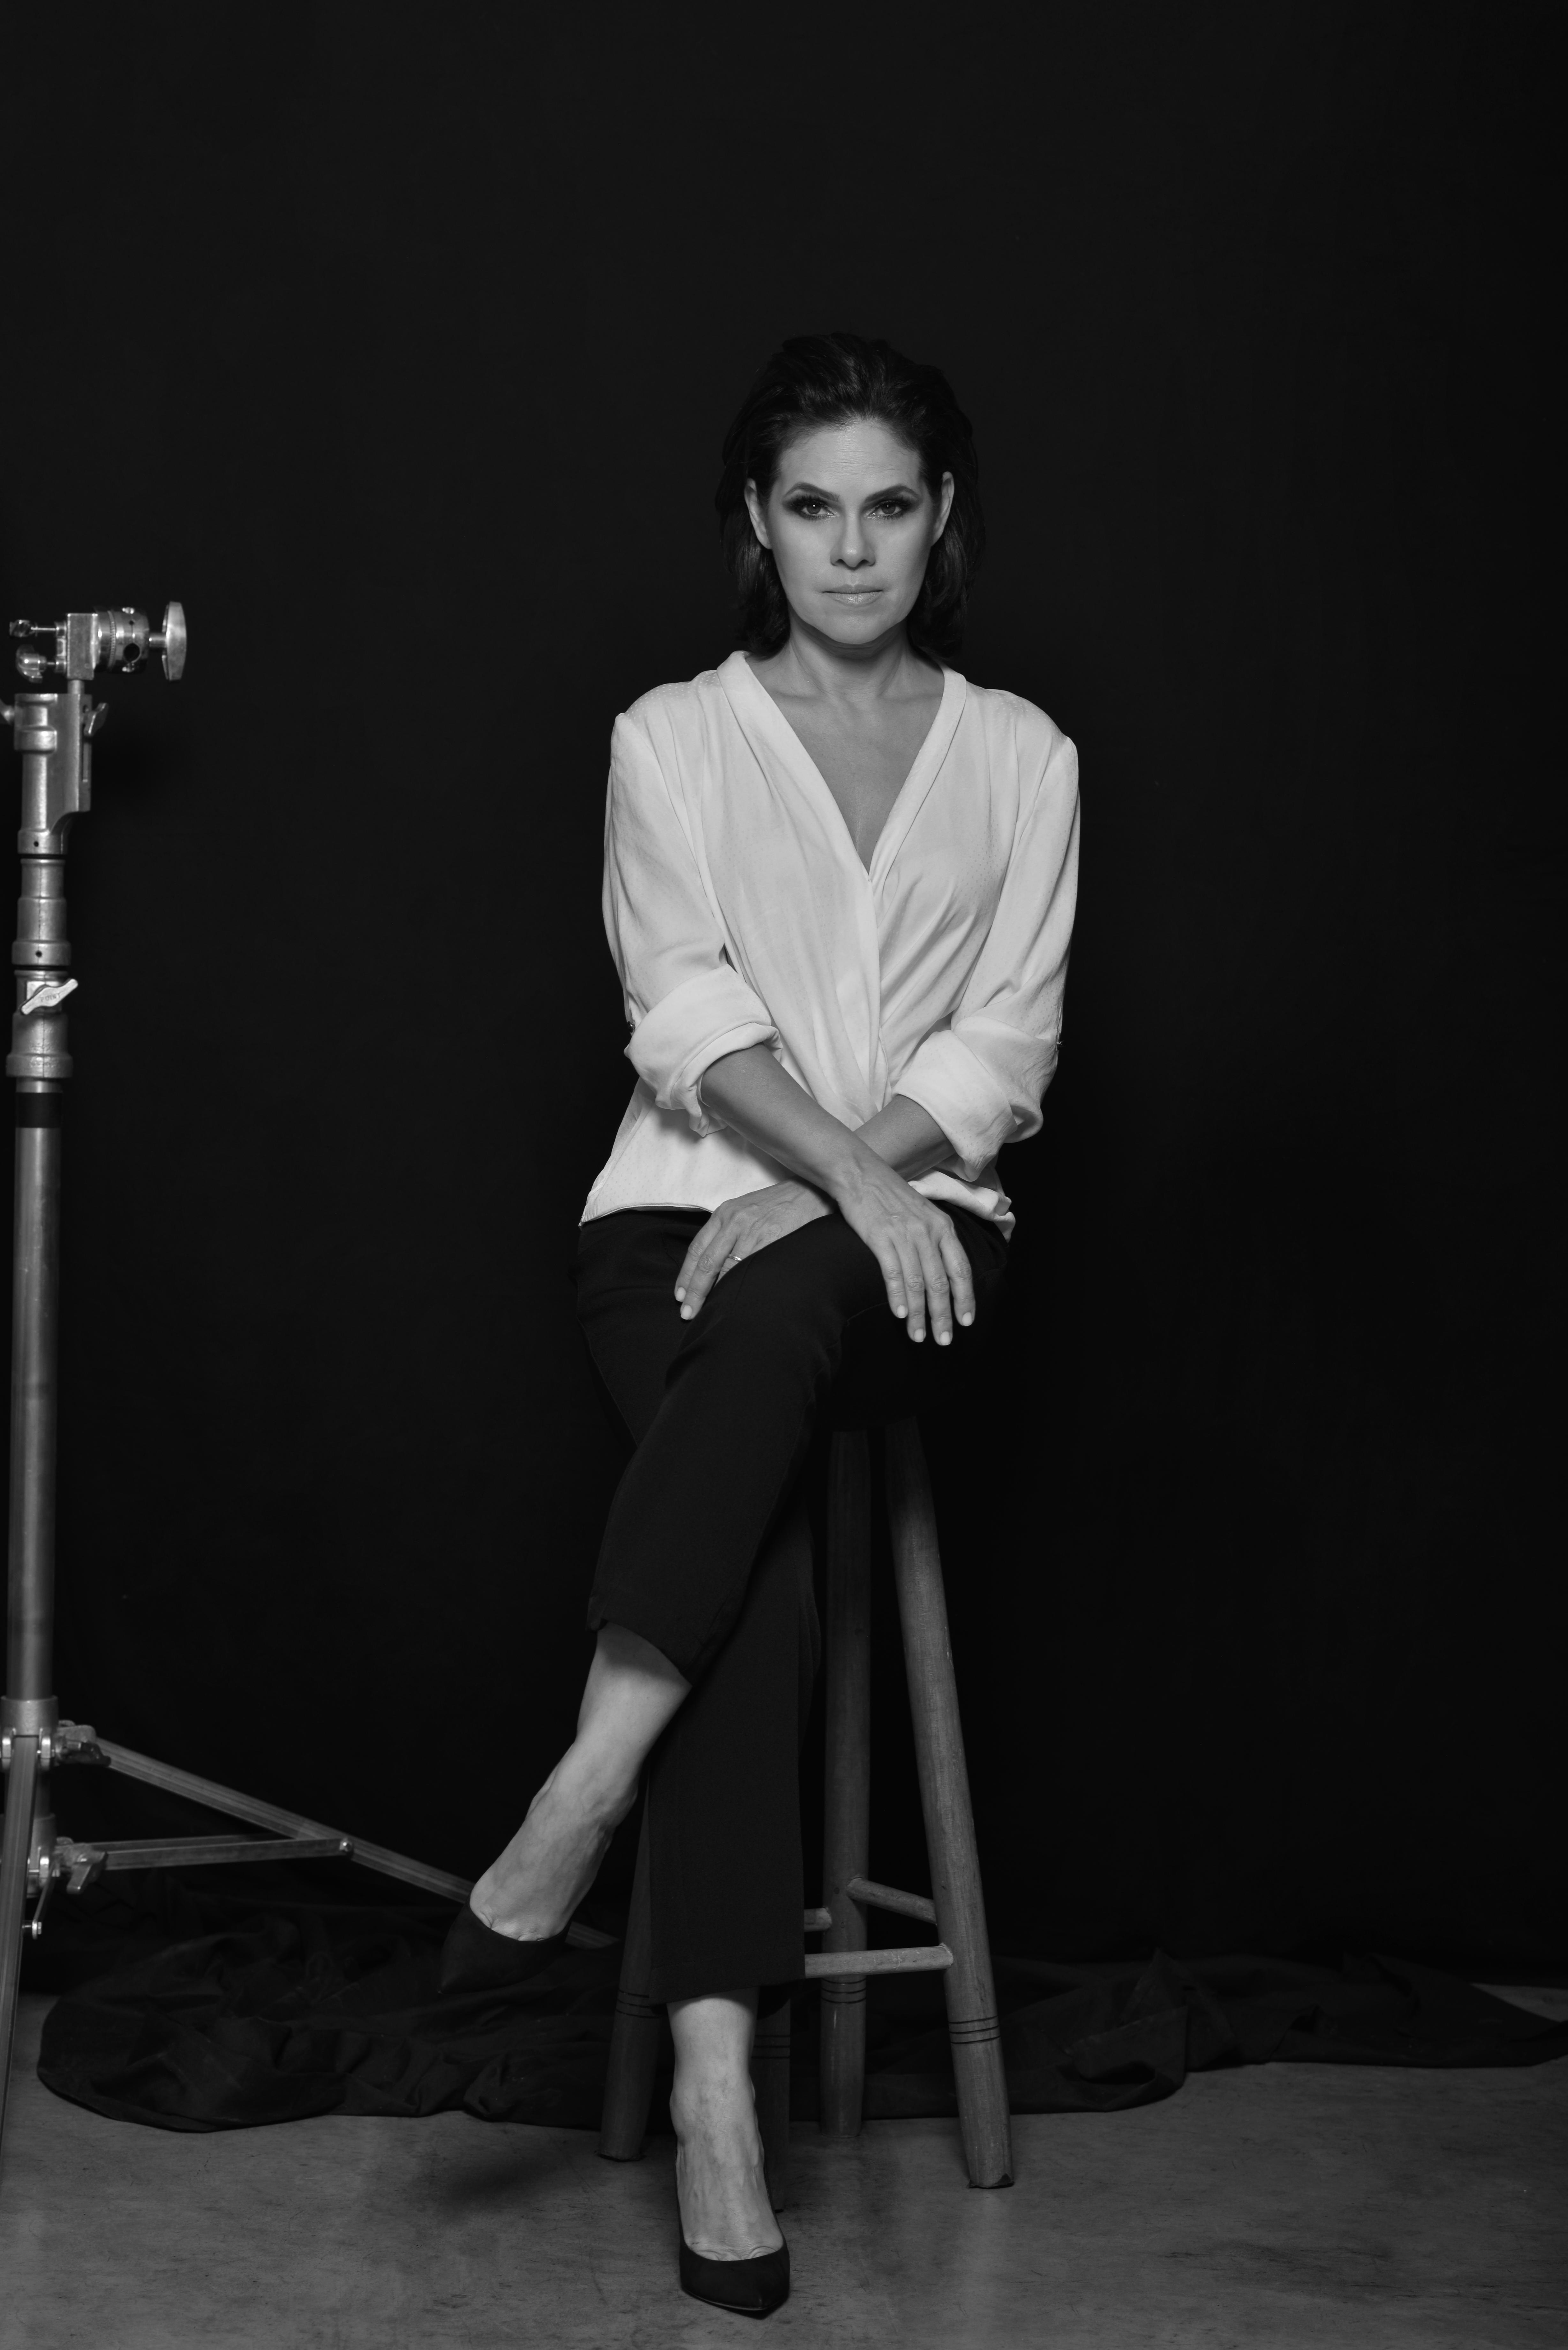 Marcia Rolon